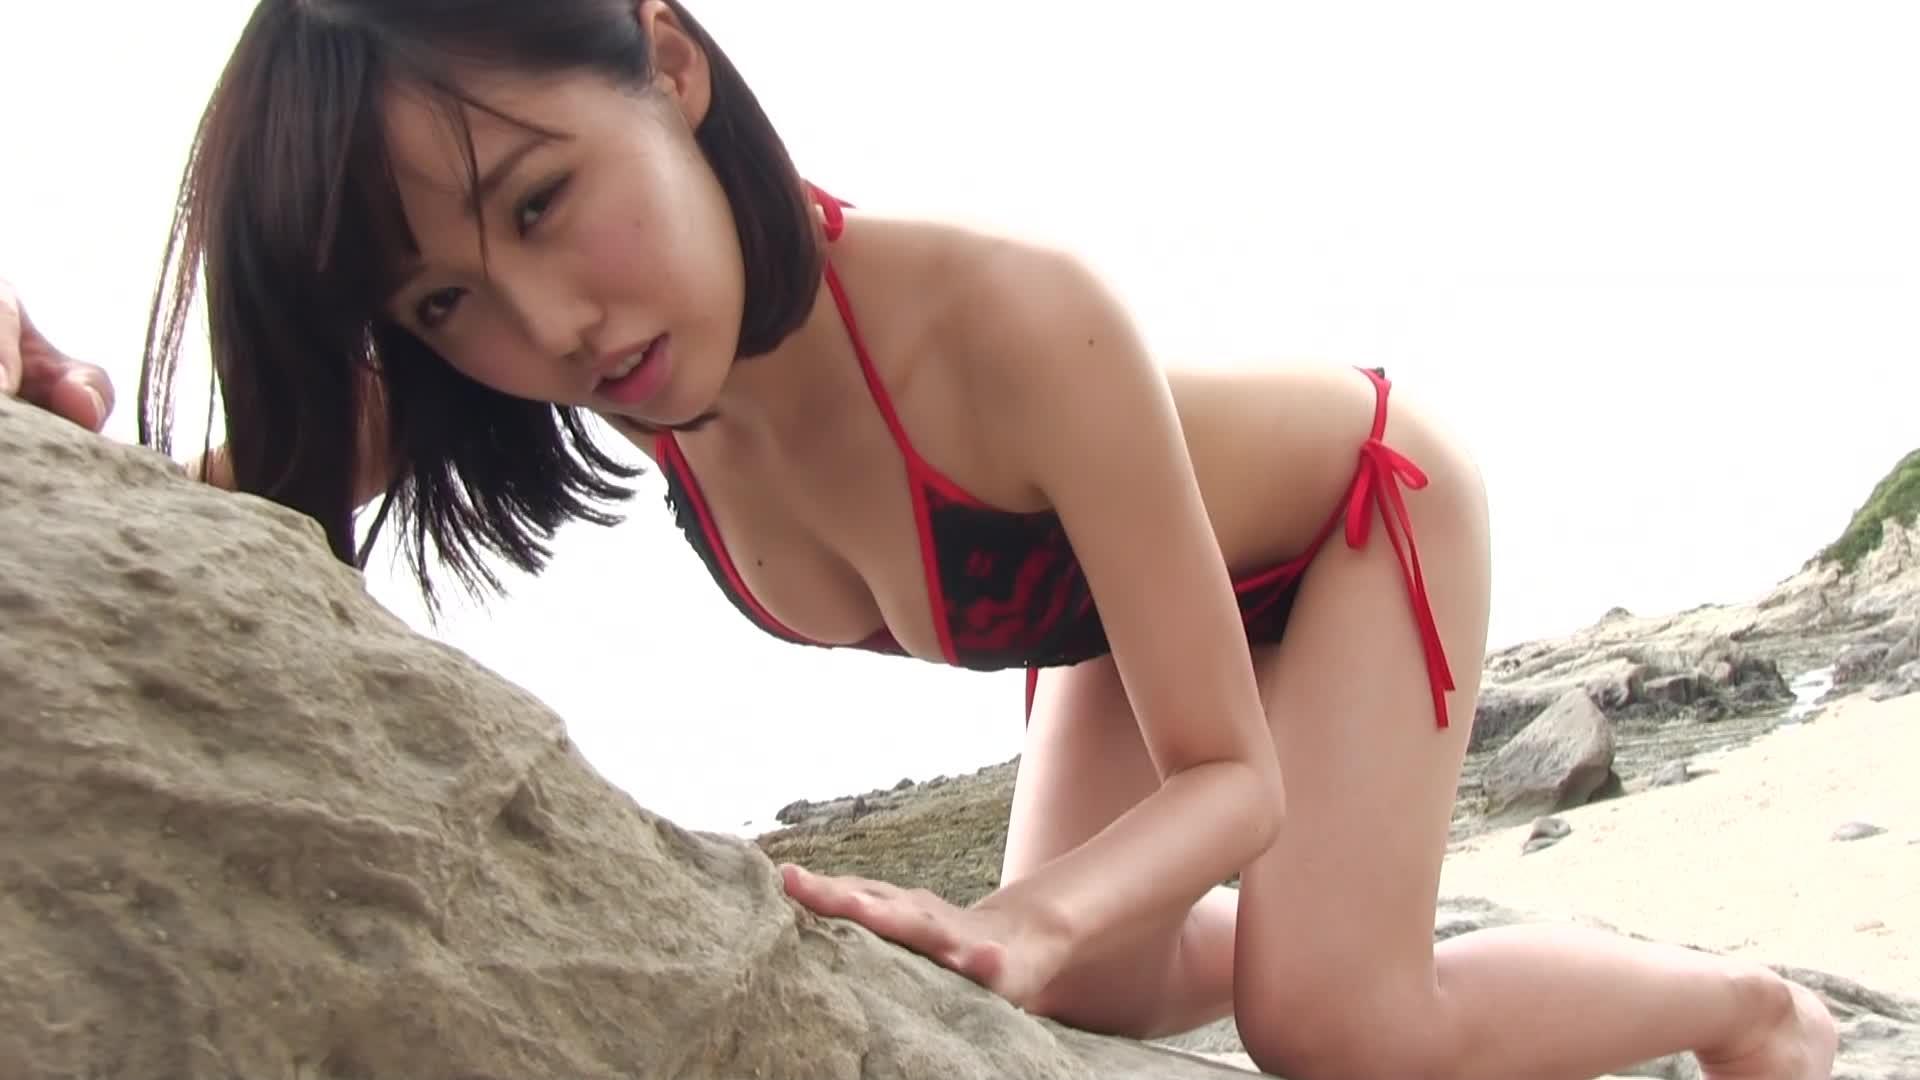 c7 - ひとりバカンス/稲森美優